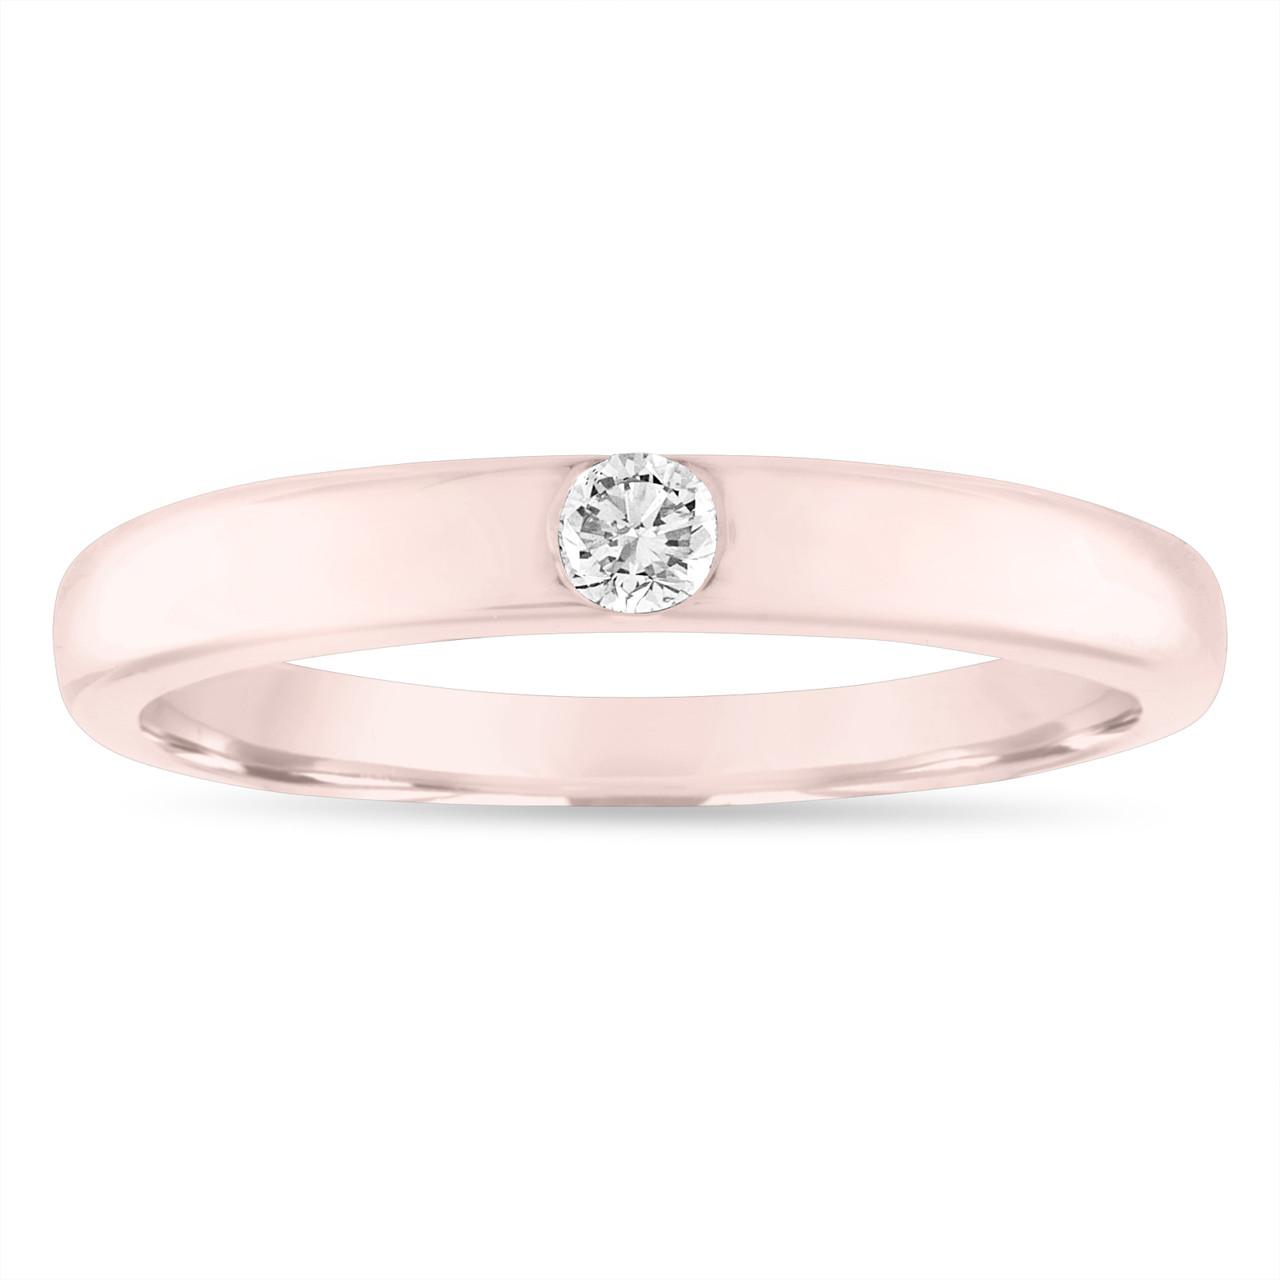 Rose Gold Diamond Wedding Band 0 10 Carat Diamond Wedding Ring Womens Solitaire Engagement Ring 3 Mm Anniversary Ring Handmade